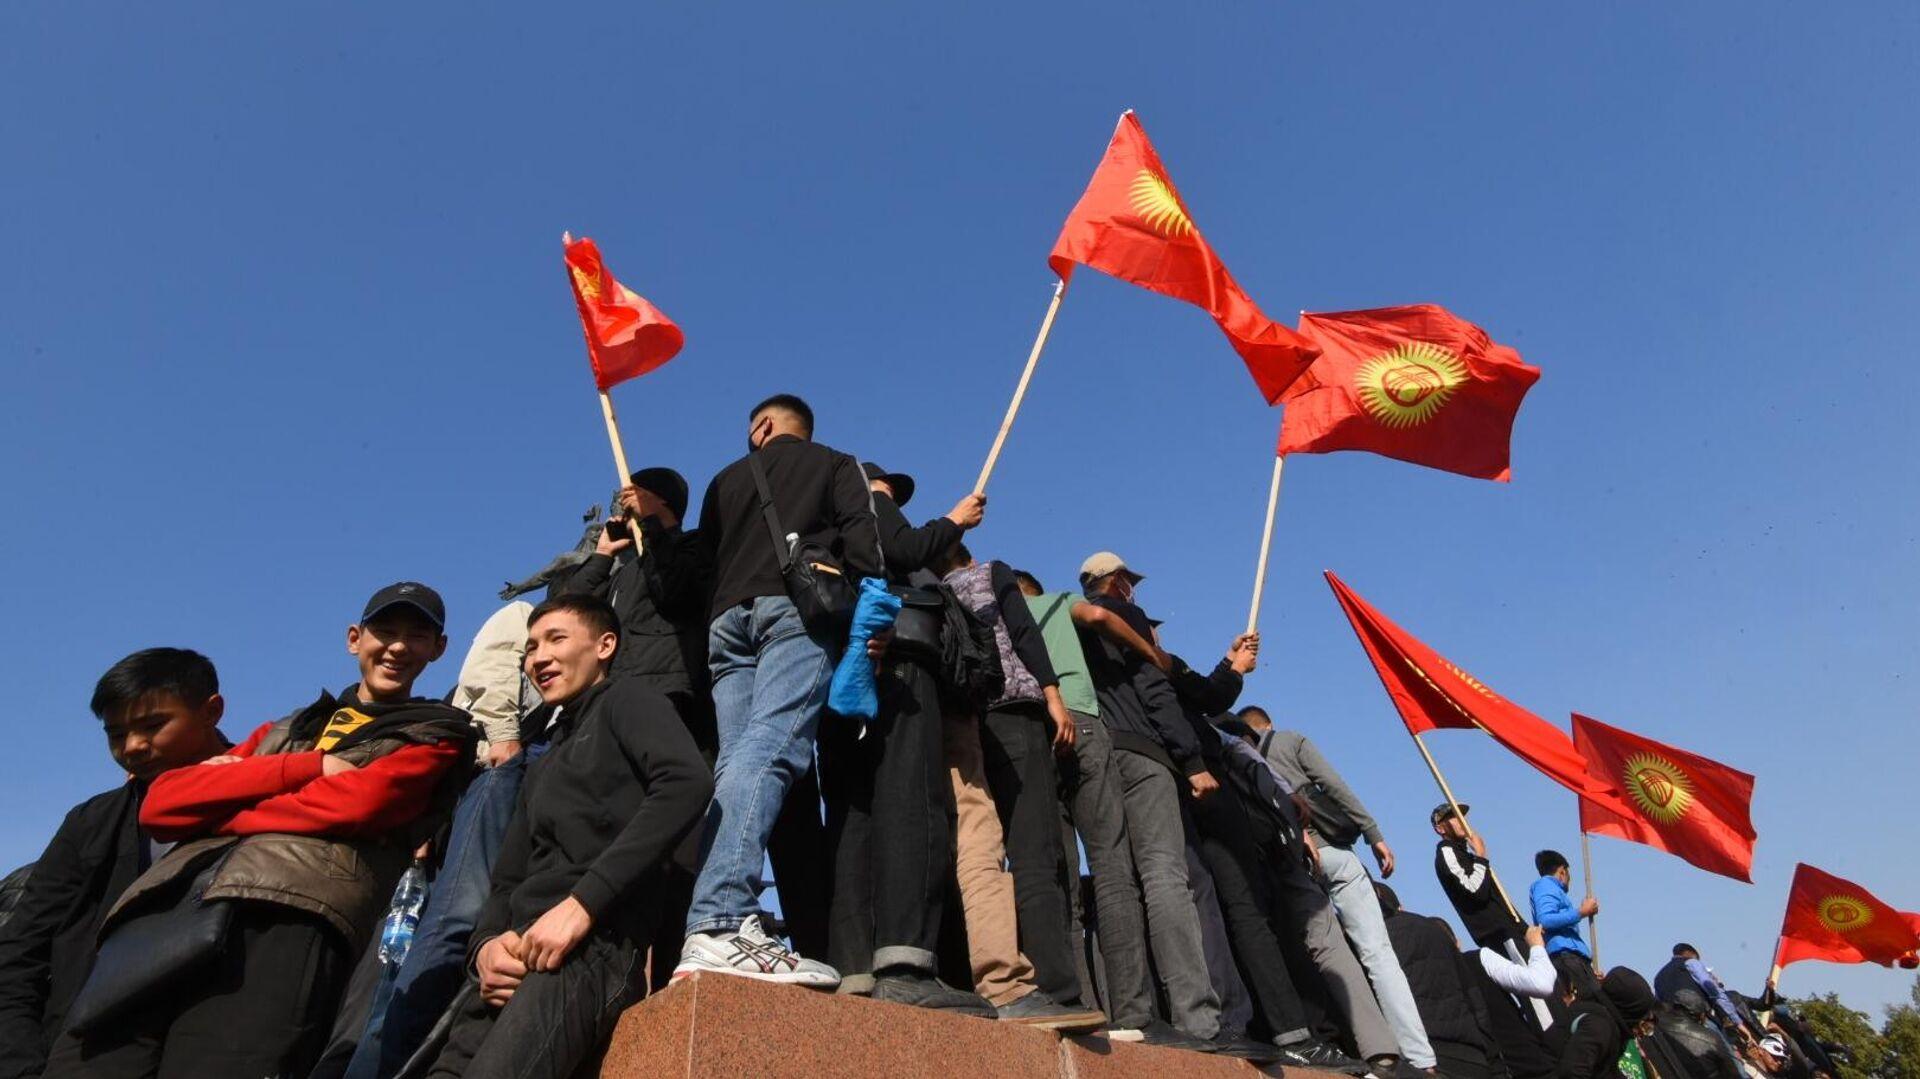 Участники акции протеста в Бишкеке - РИА Новости, 1920, 08.10.2020